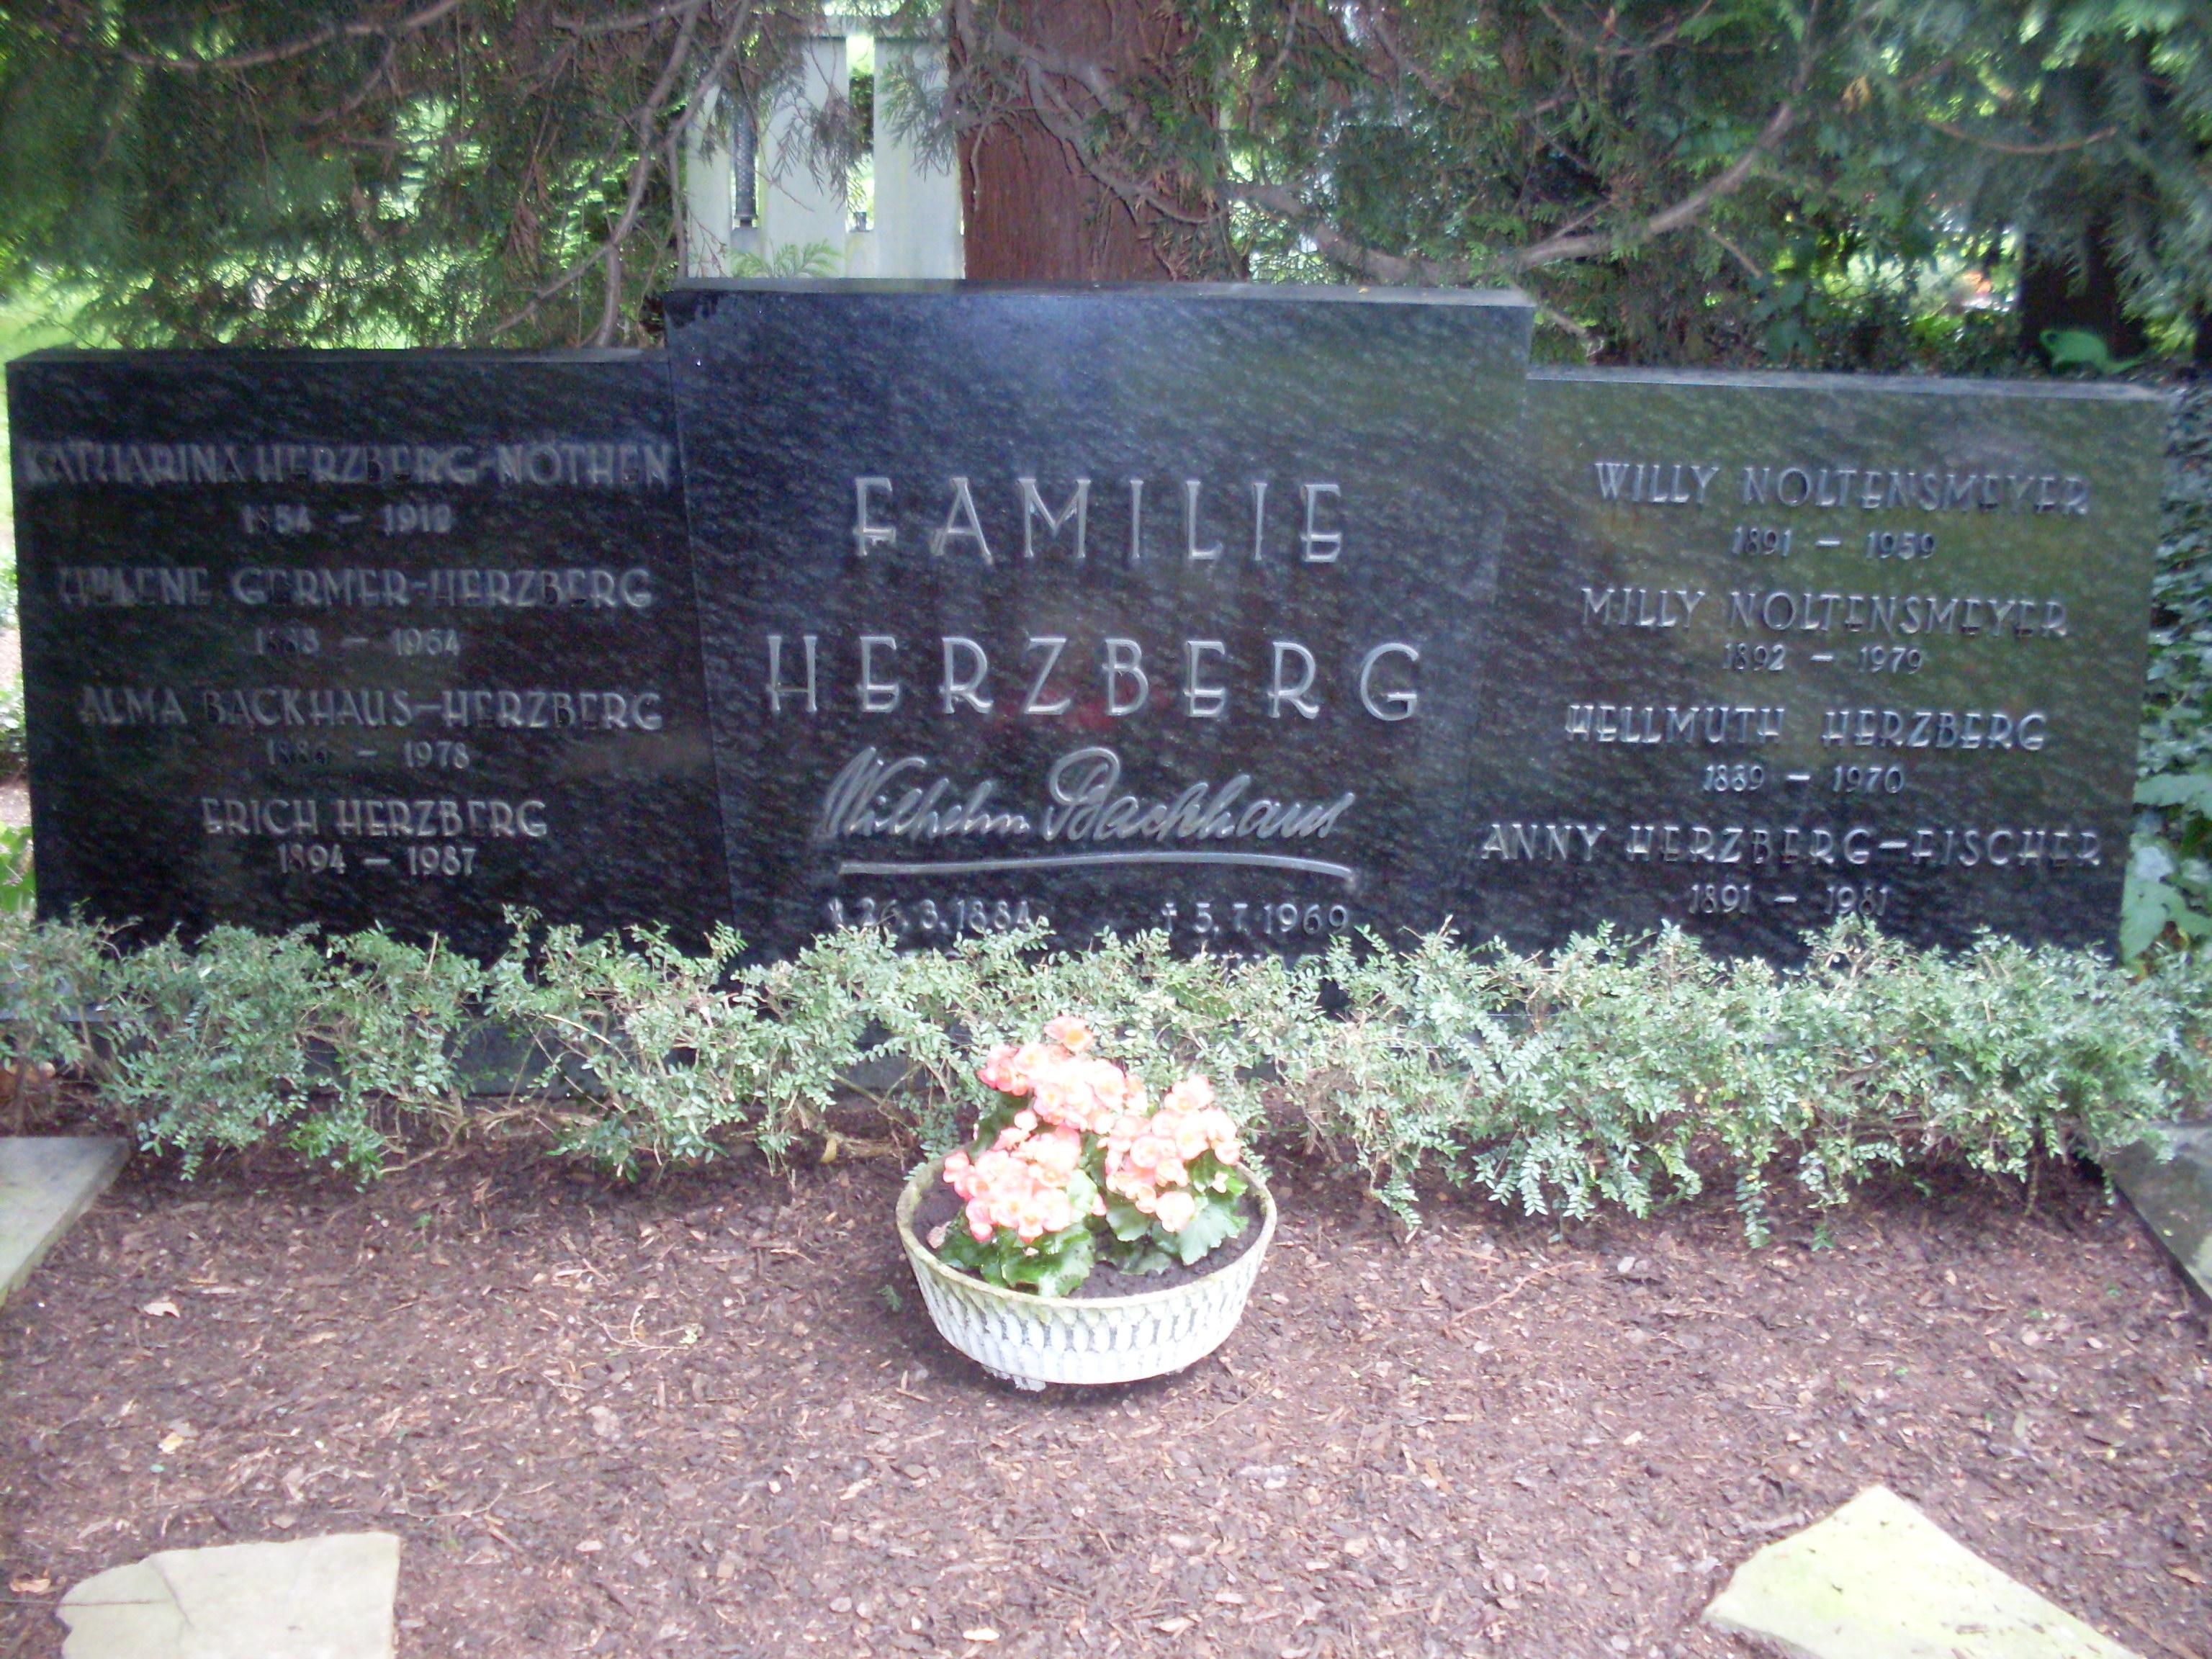 Familiengrab der familie herzberg auf dem kölner melaten friedhof jpg